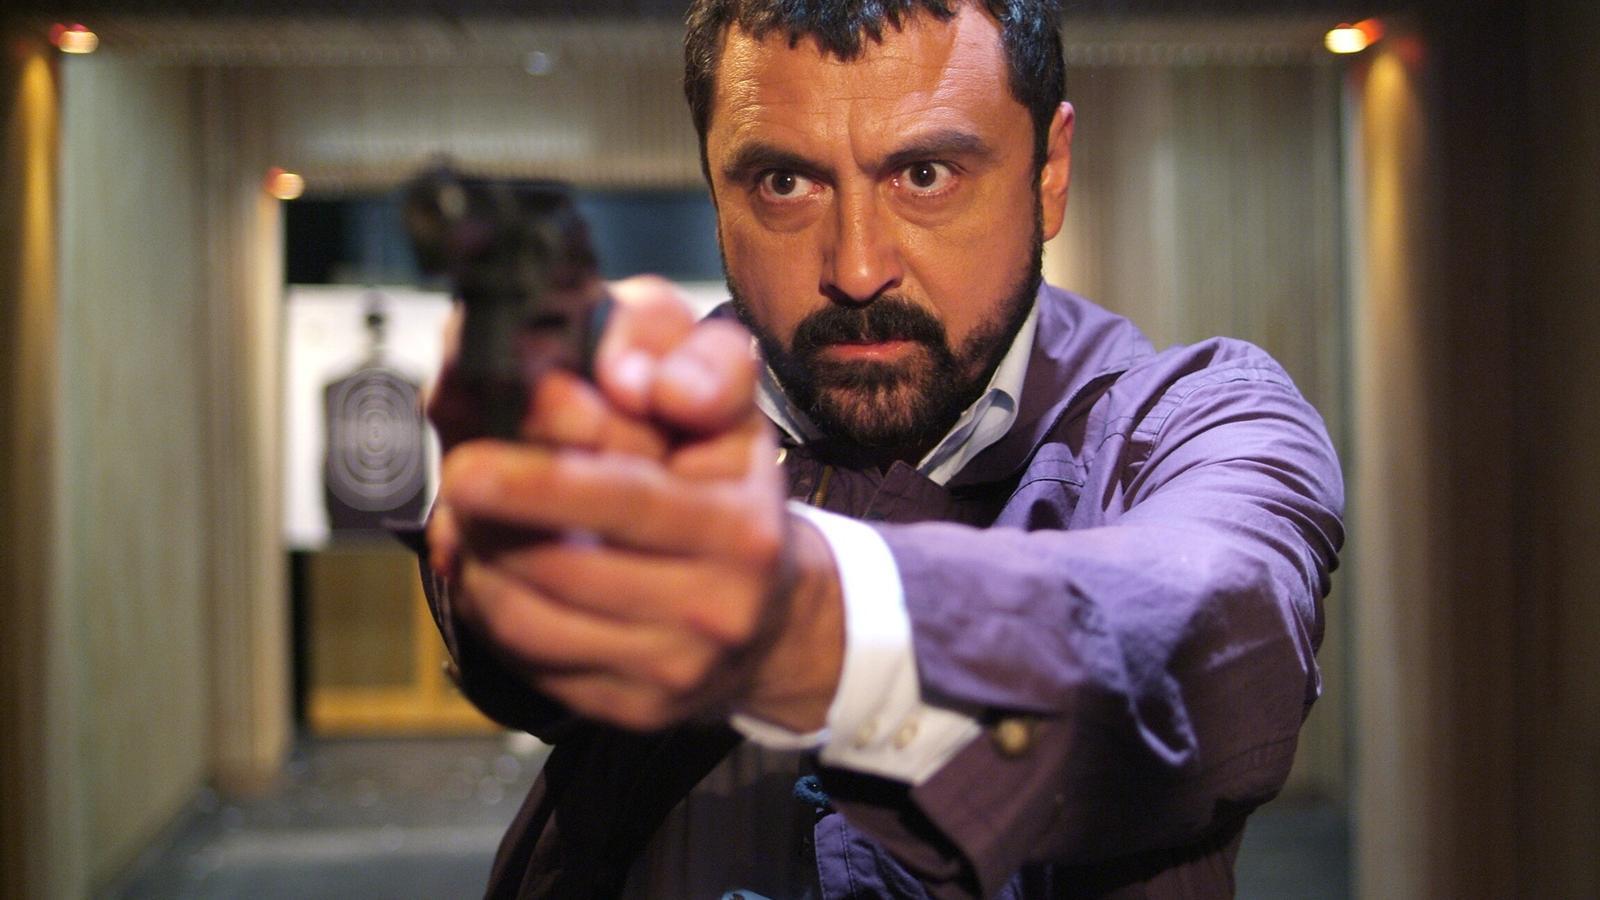 Antena 3 recupera 'Los hombres de Paco' després d'una dècada